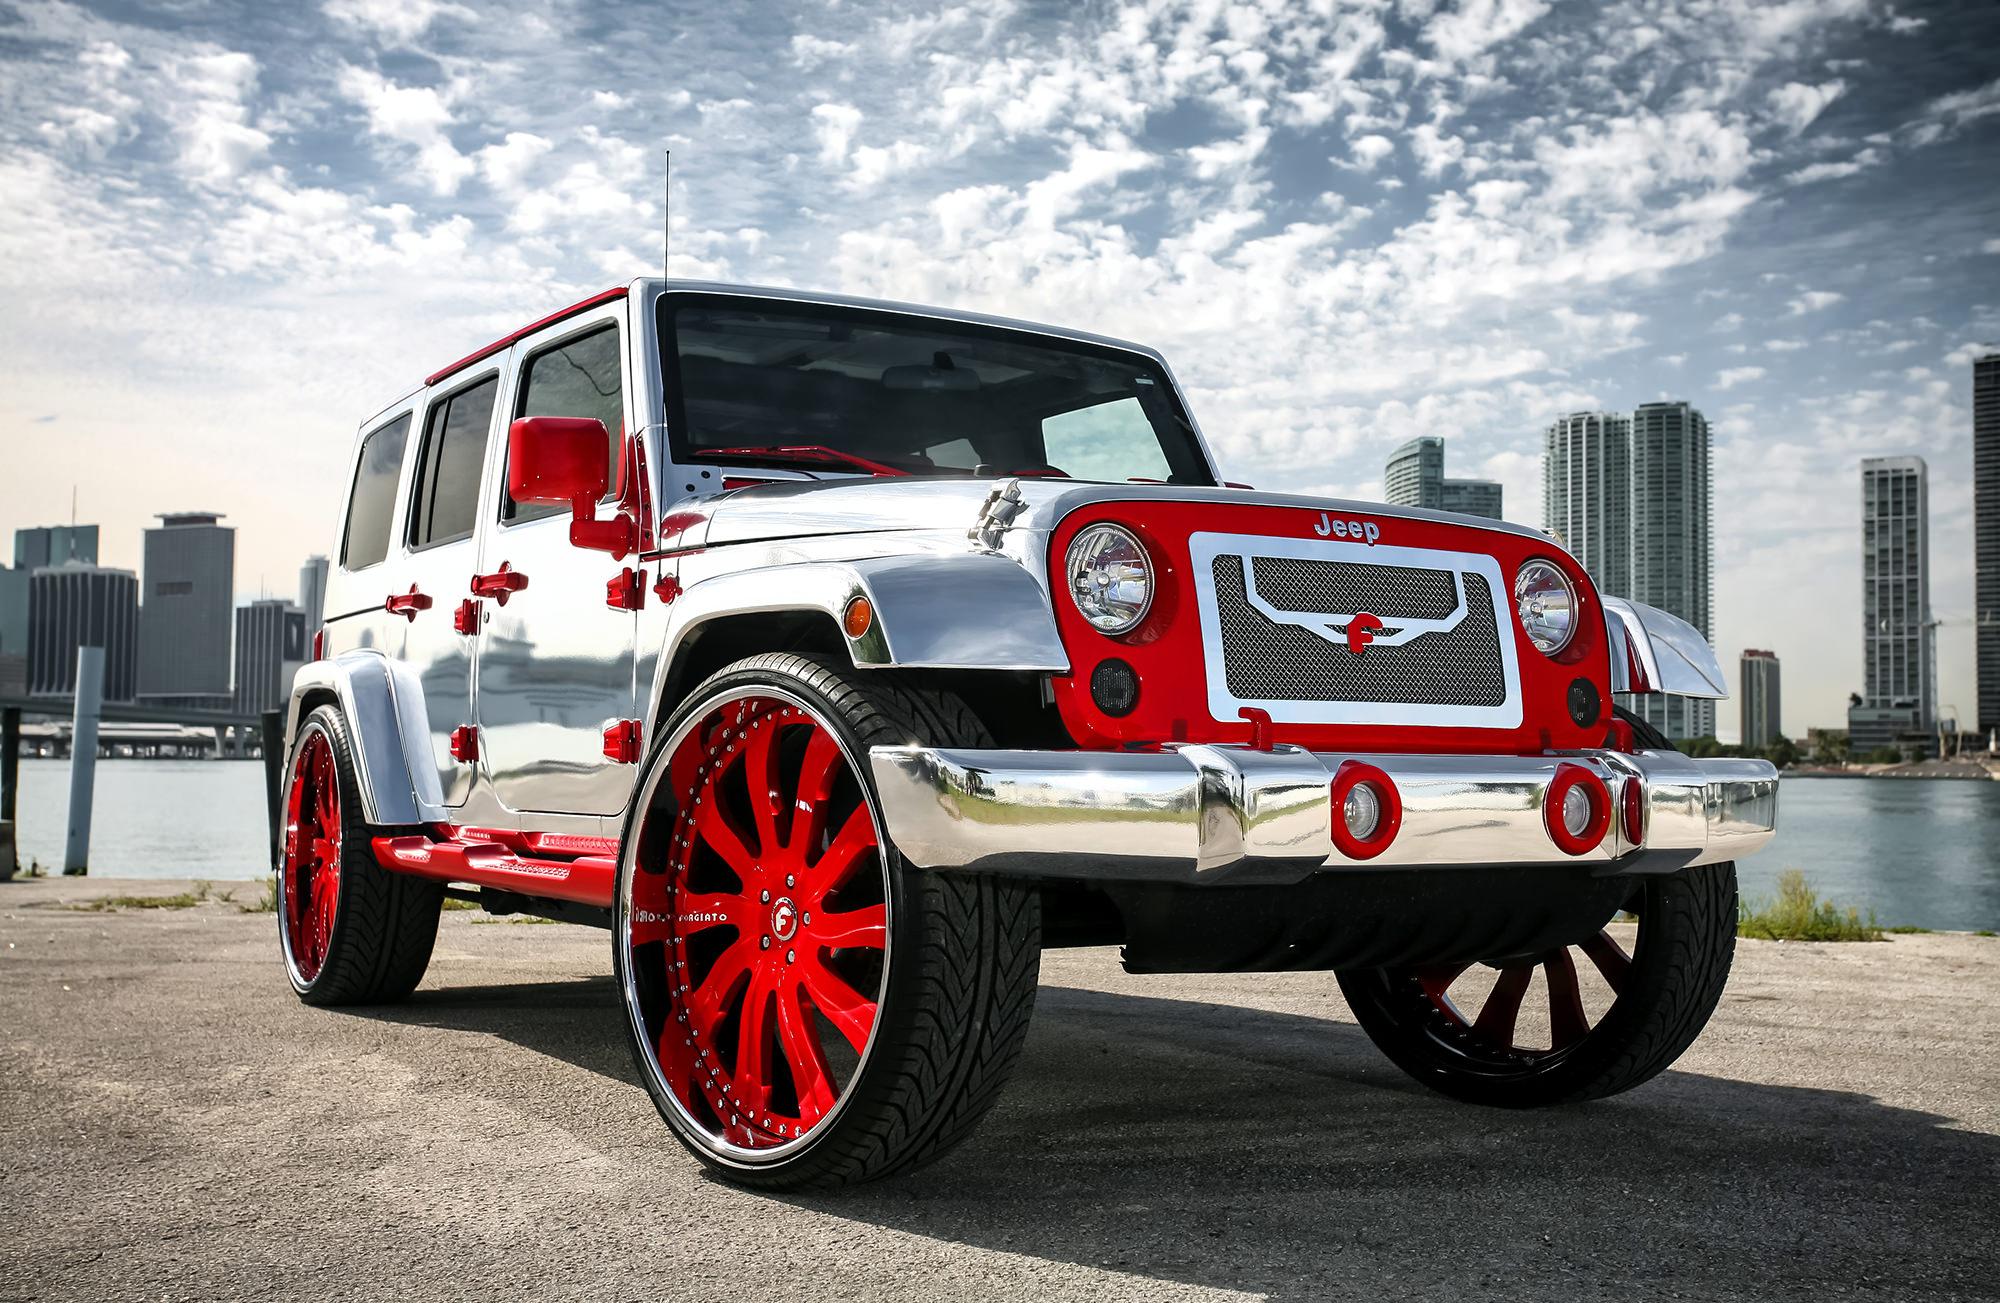 Rims Inch Custom 28 : Jeep on inch forgiato big rims custom wheels